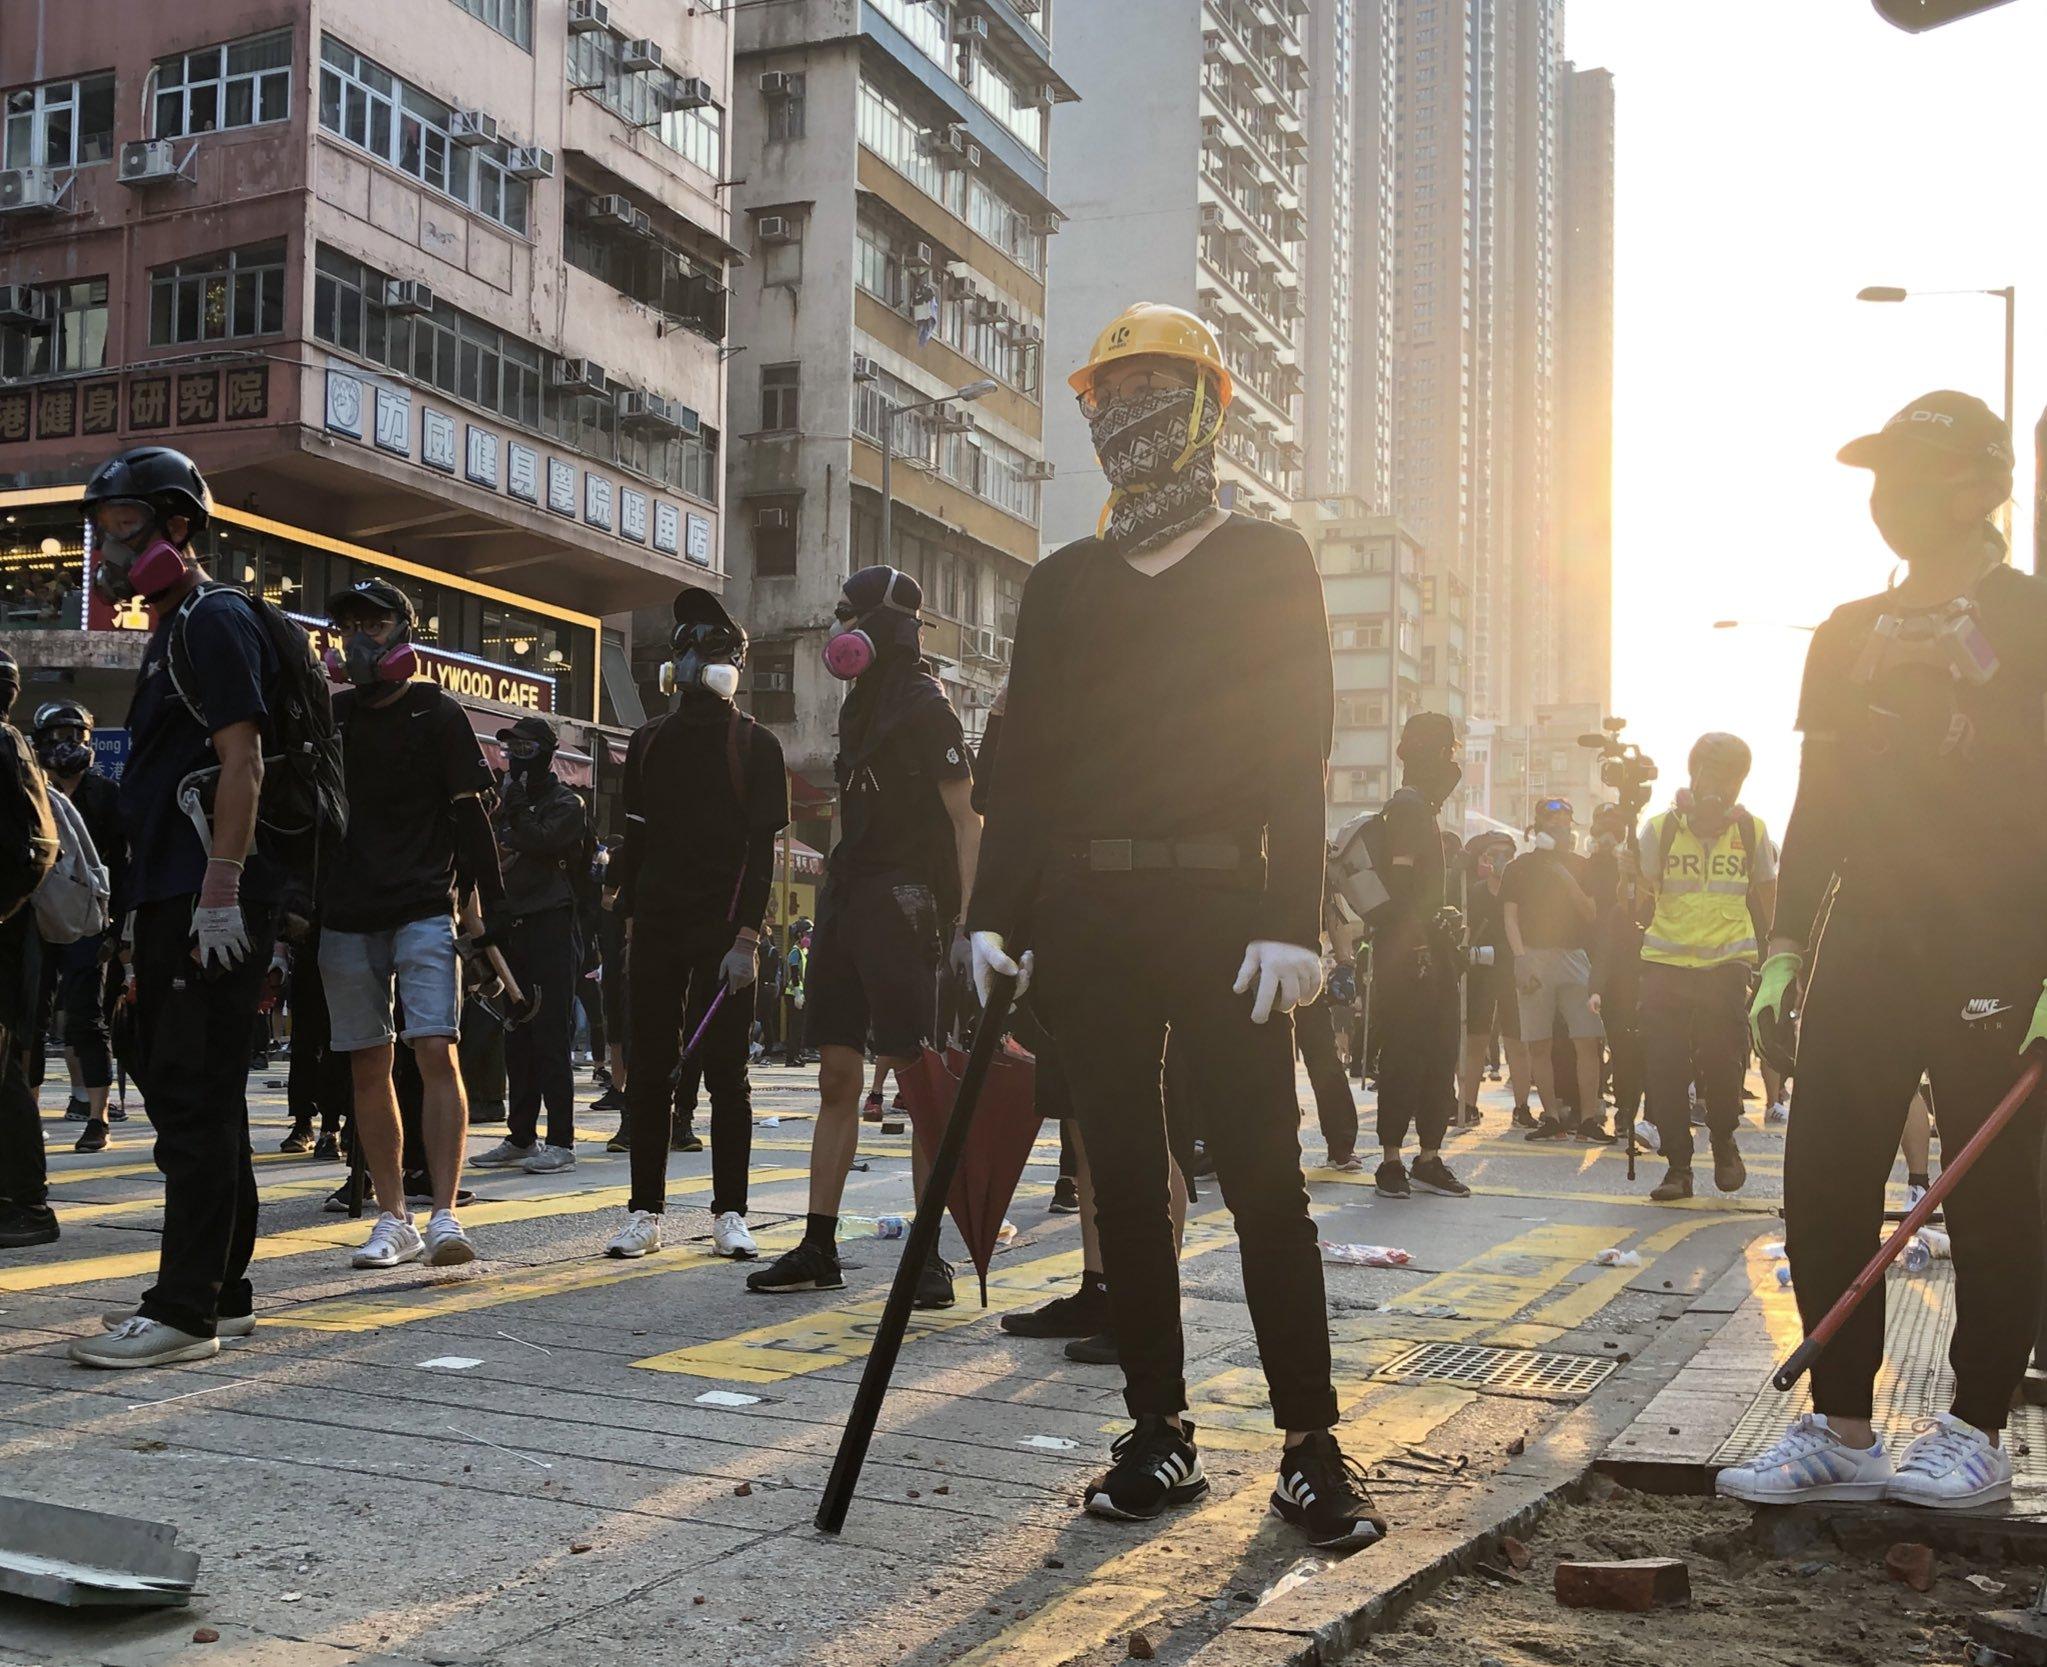 Escalating Violence in Hong Kong: Q&A With HK-based Lawyer Antony Dapiran